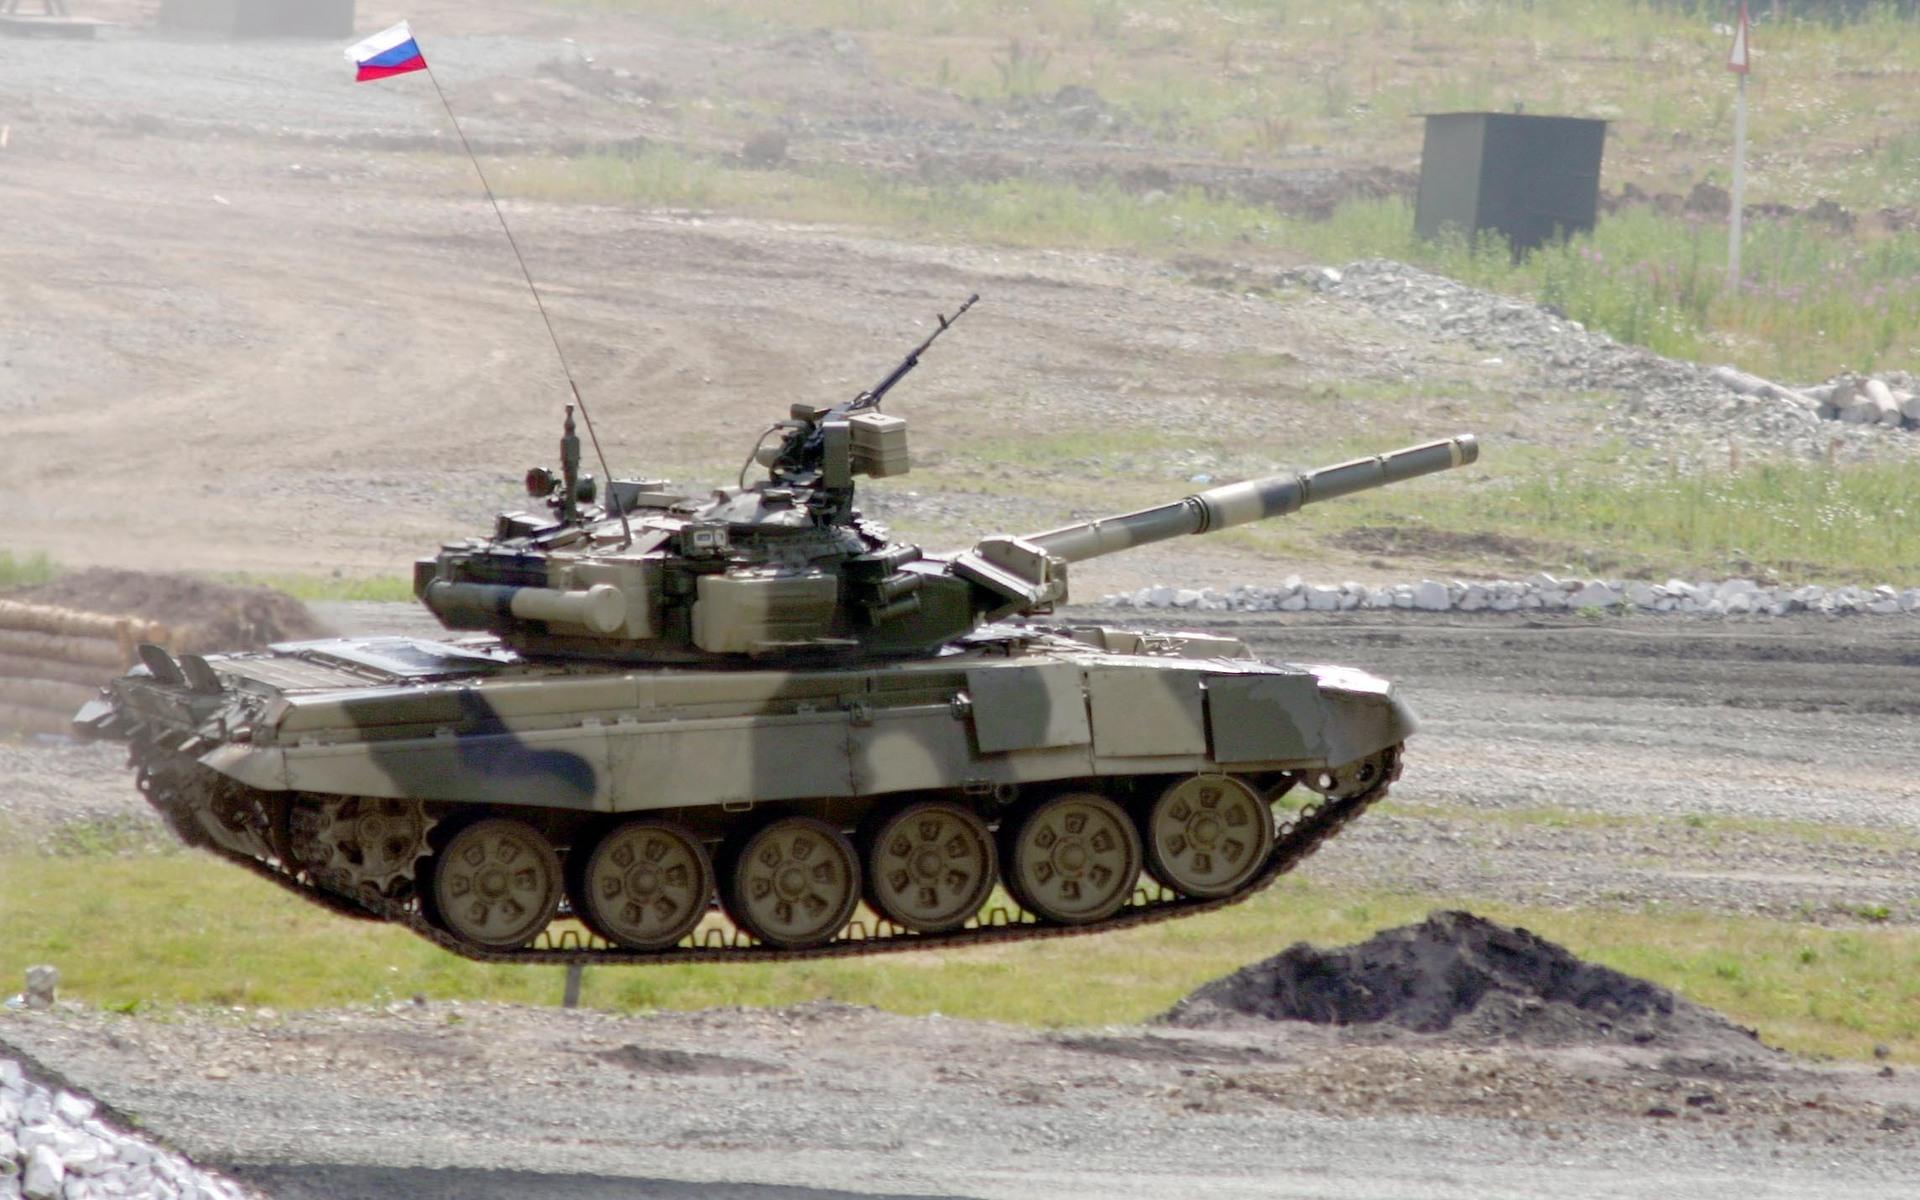 http://www.kartinki24.ru/uploads/gallery/main/345/kartinki24_militaru_0042.jpg